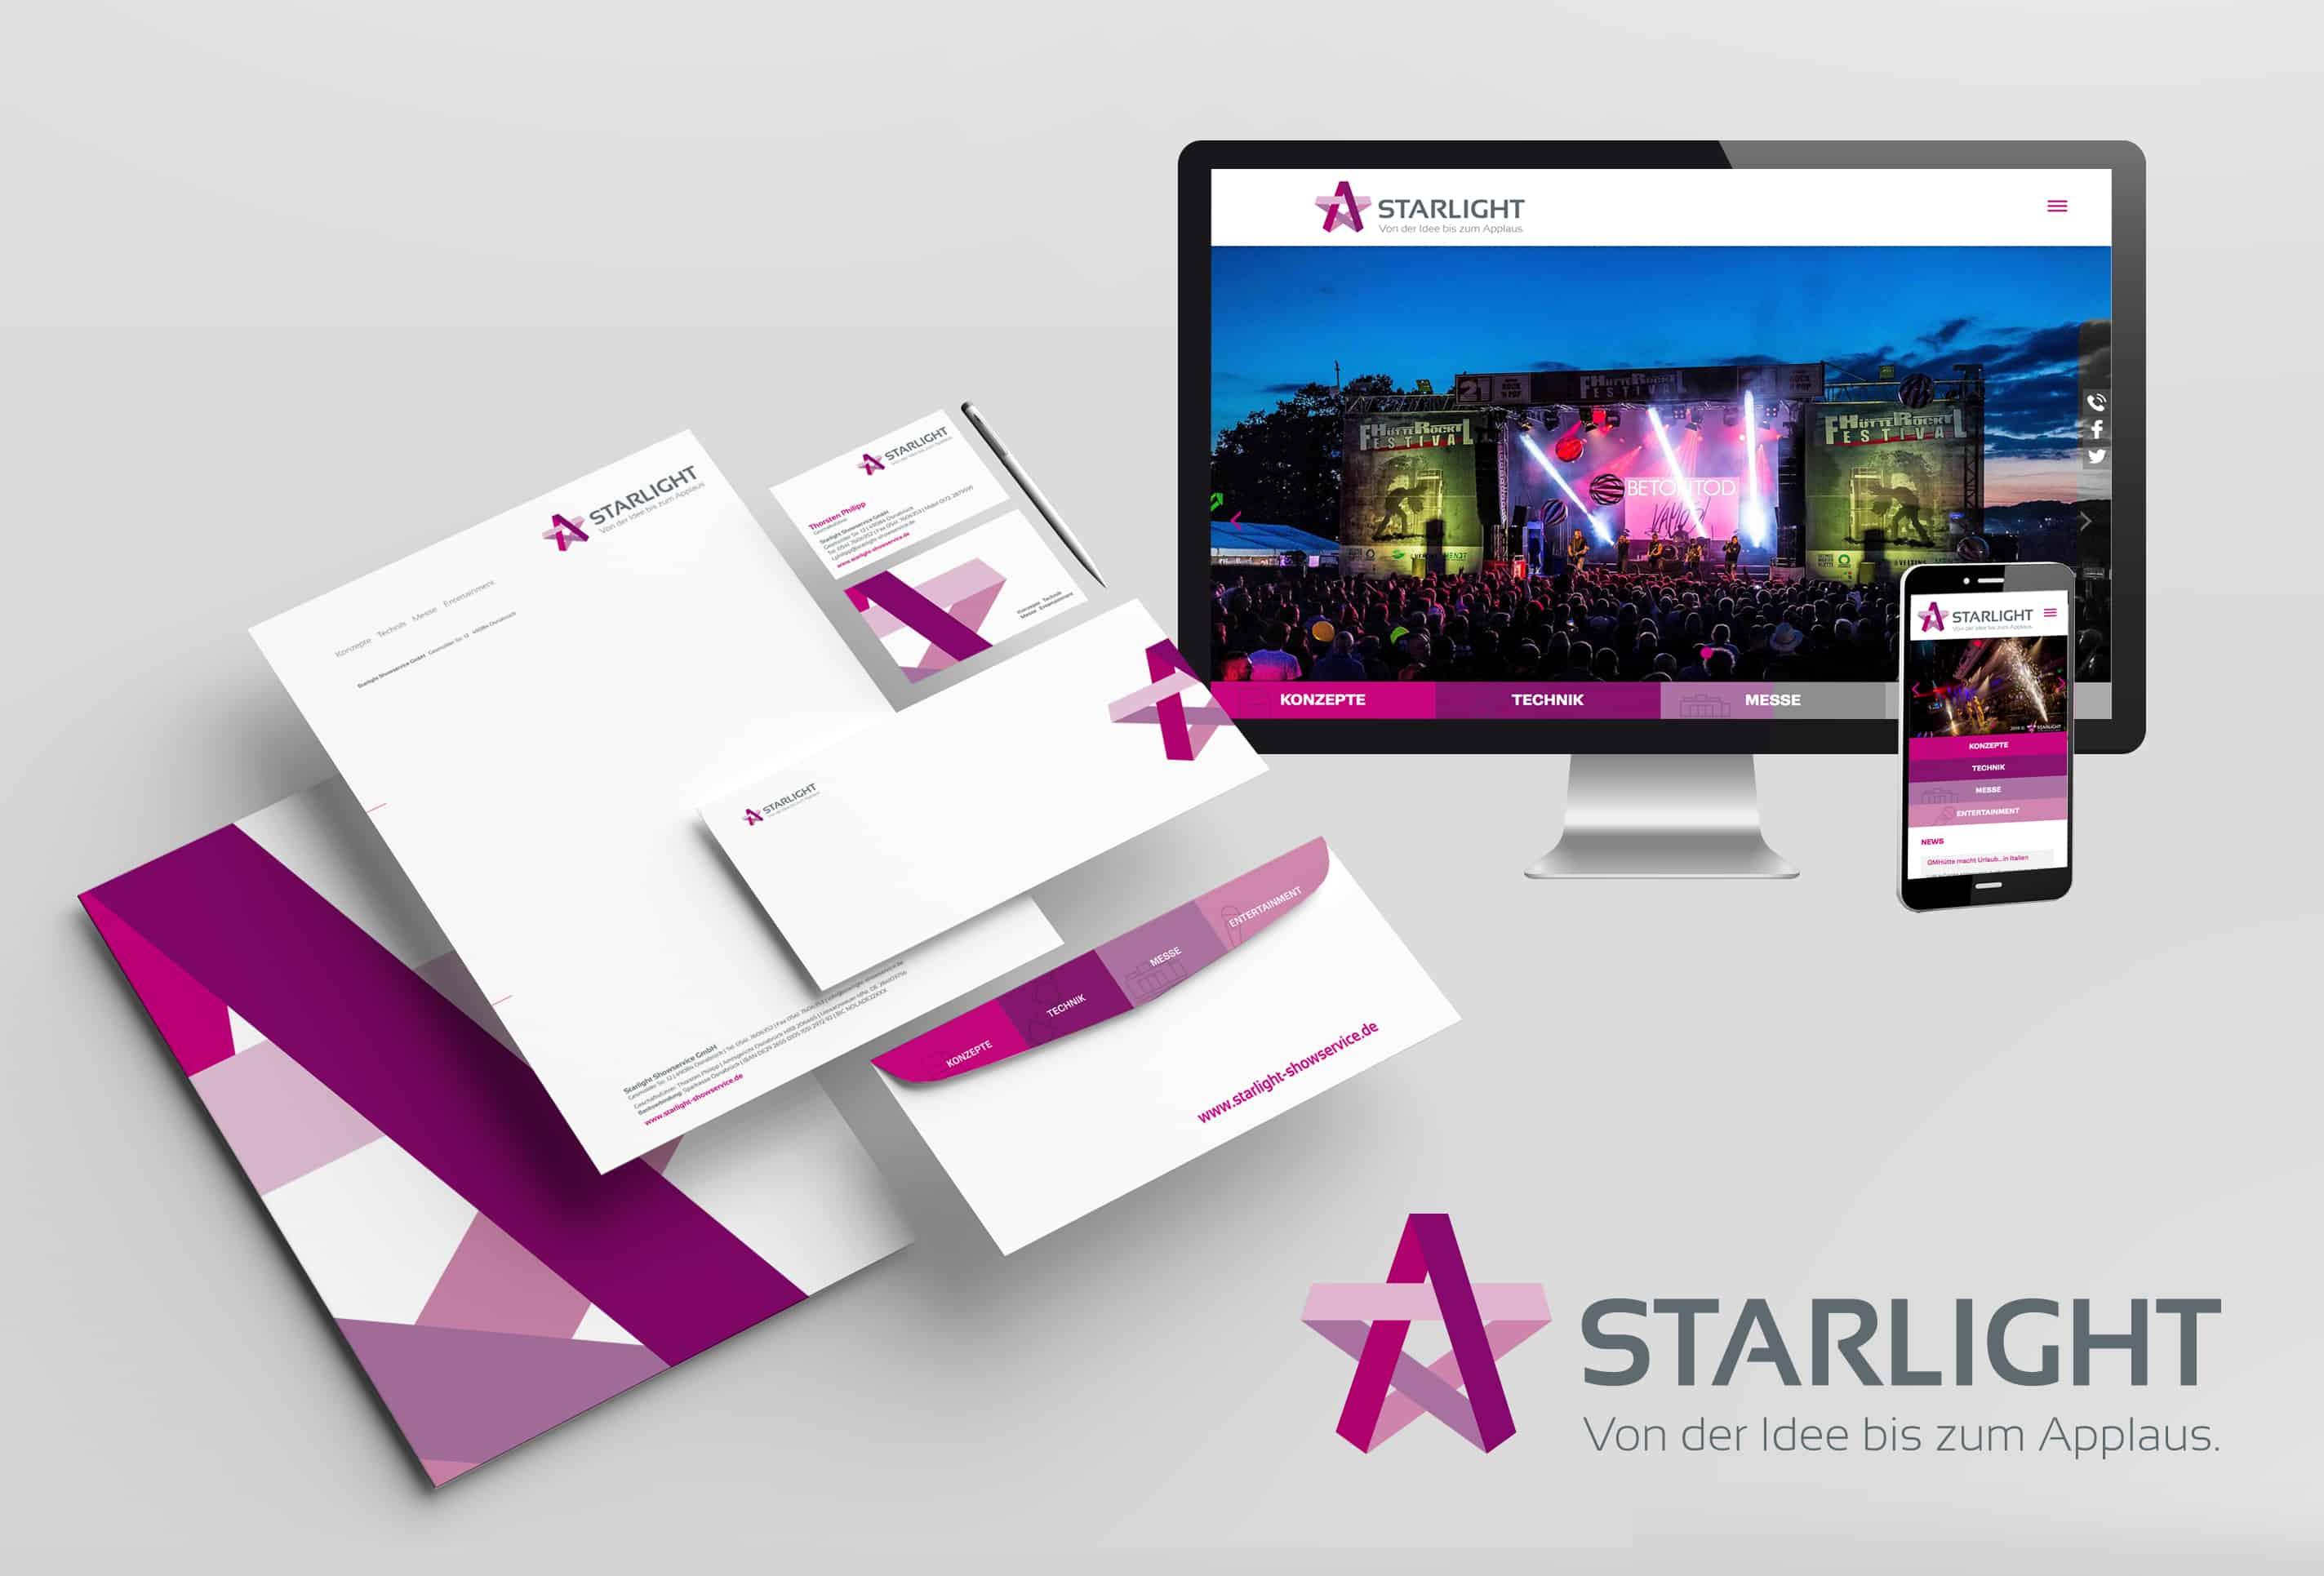 Referenz Starlight Corporate Design